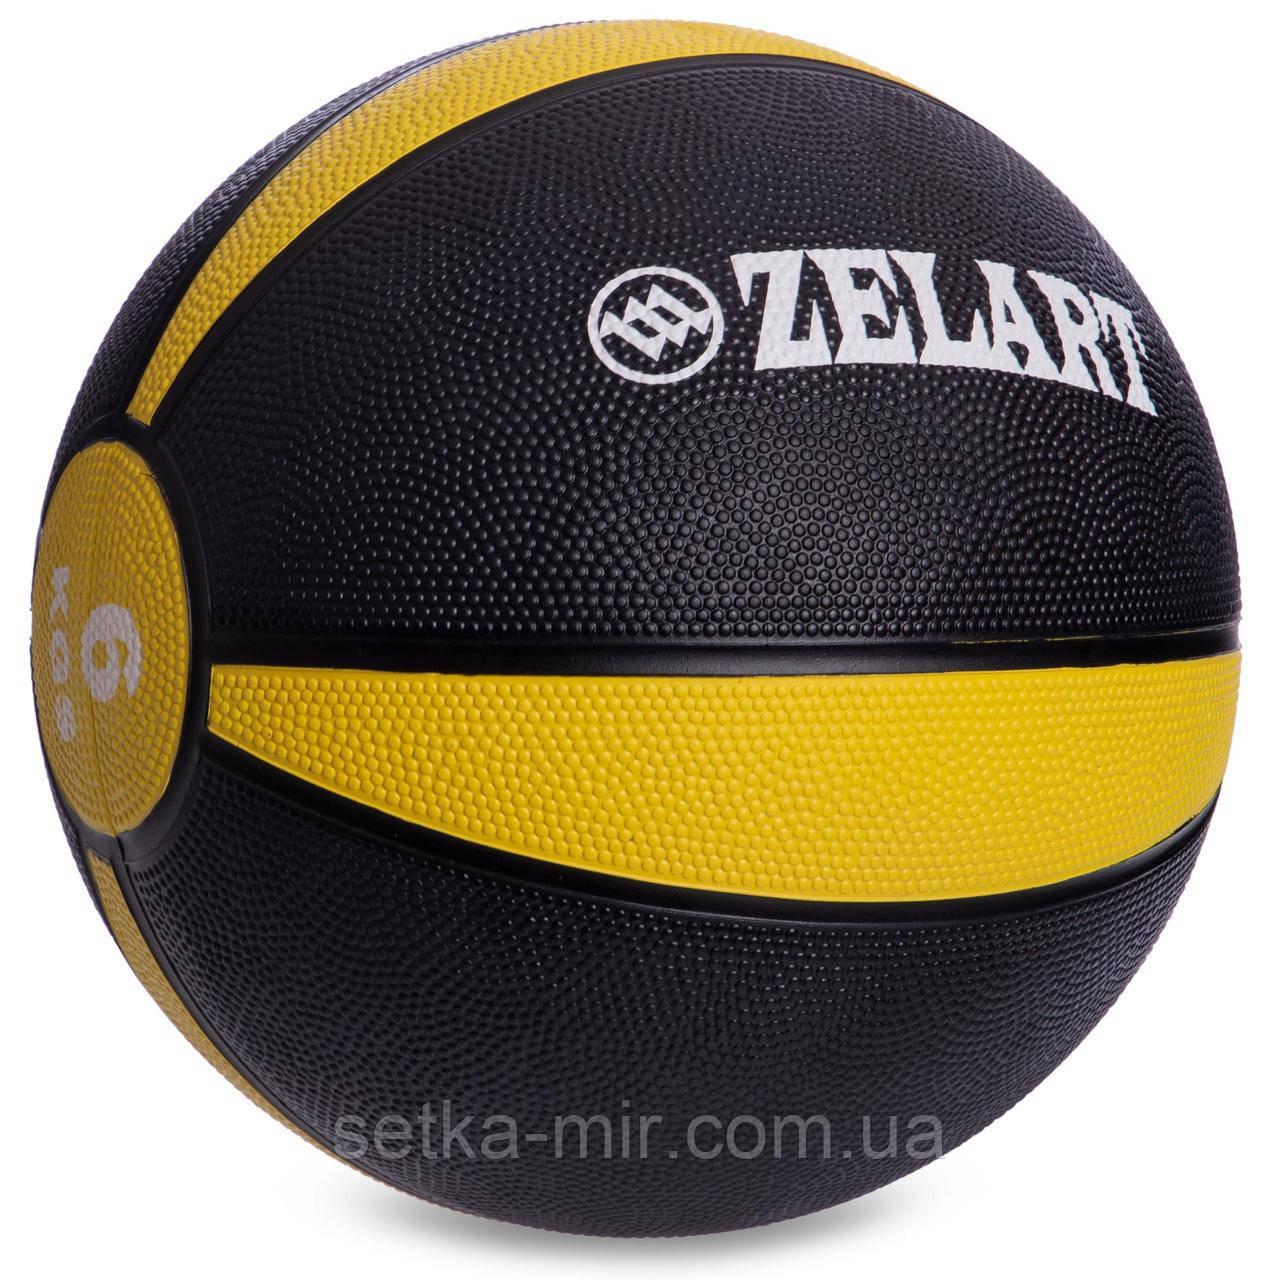 М'яч медичний медбол Zelart Medicine Ball FI-5122-6 6кг